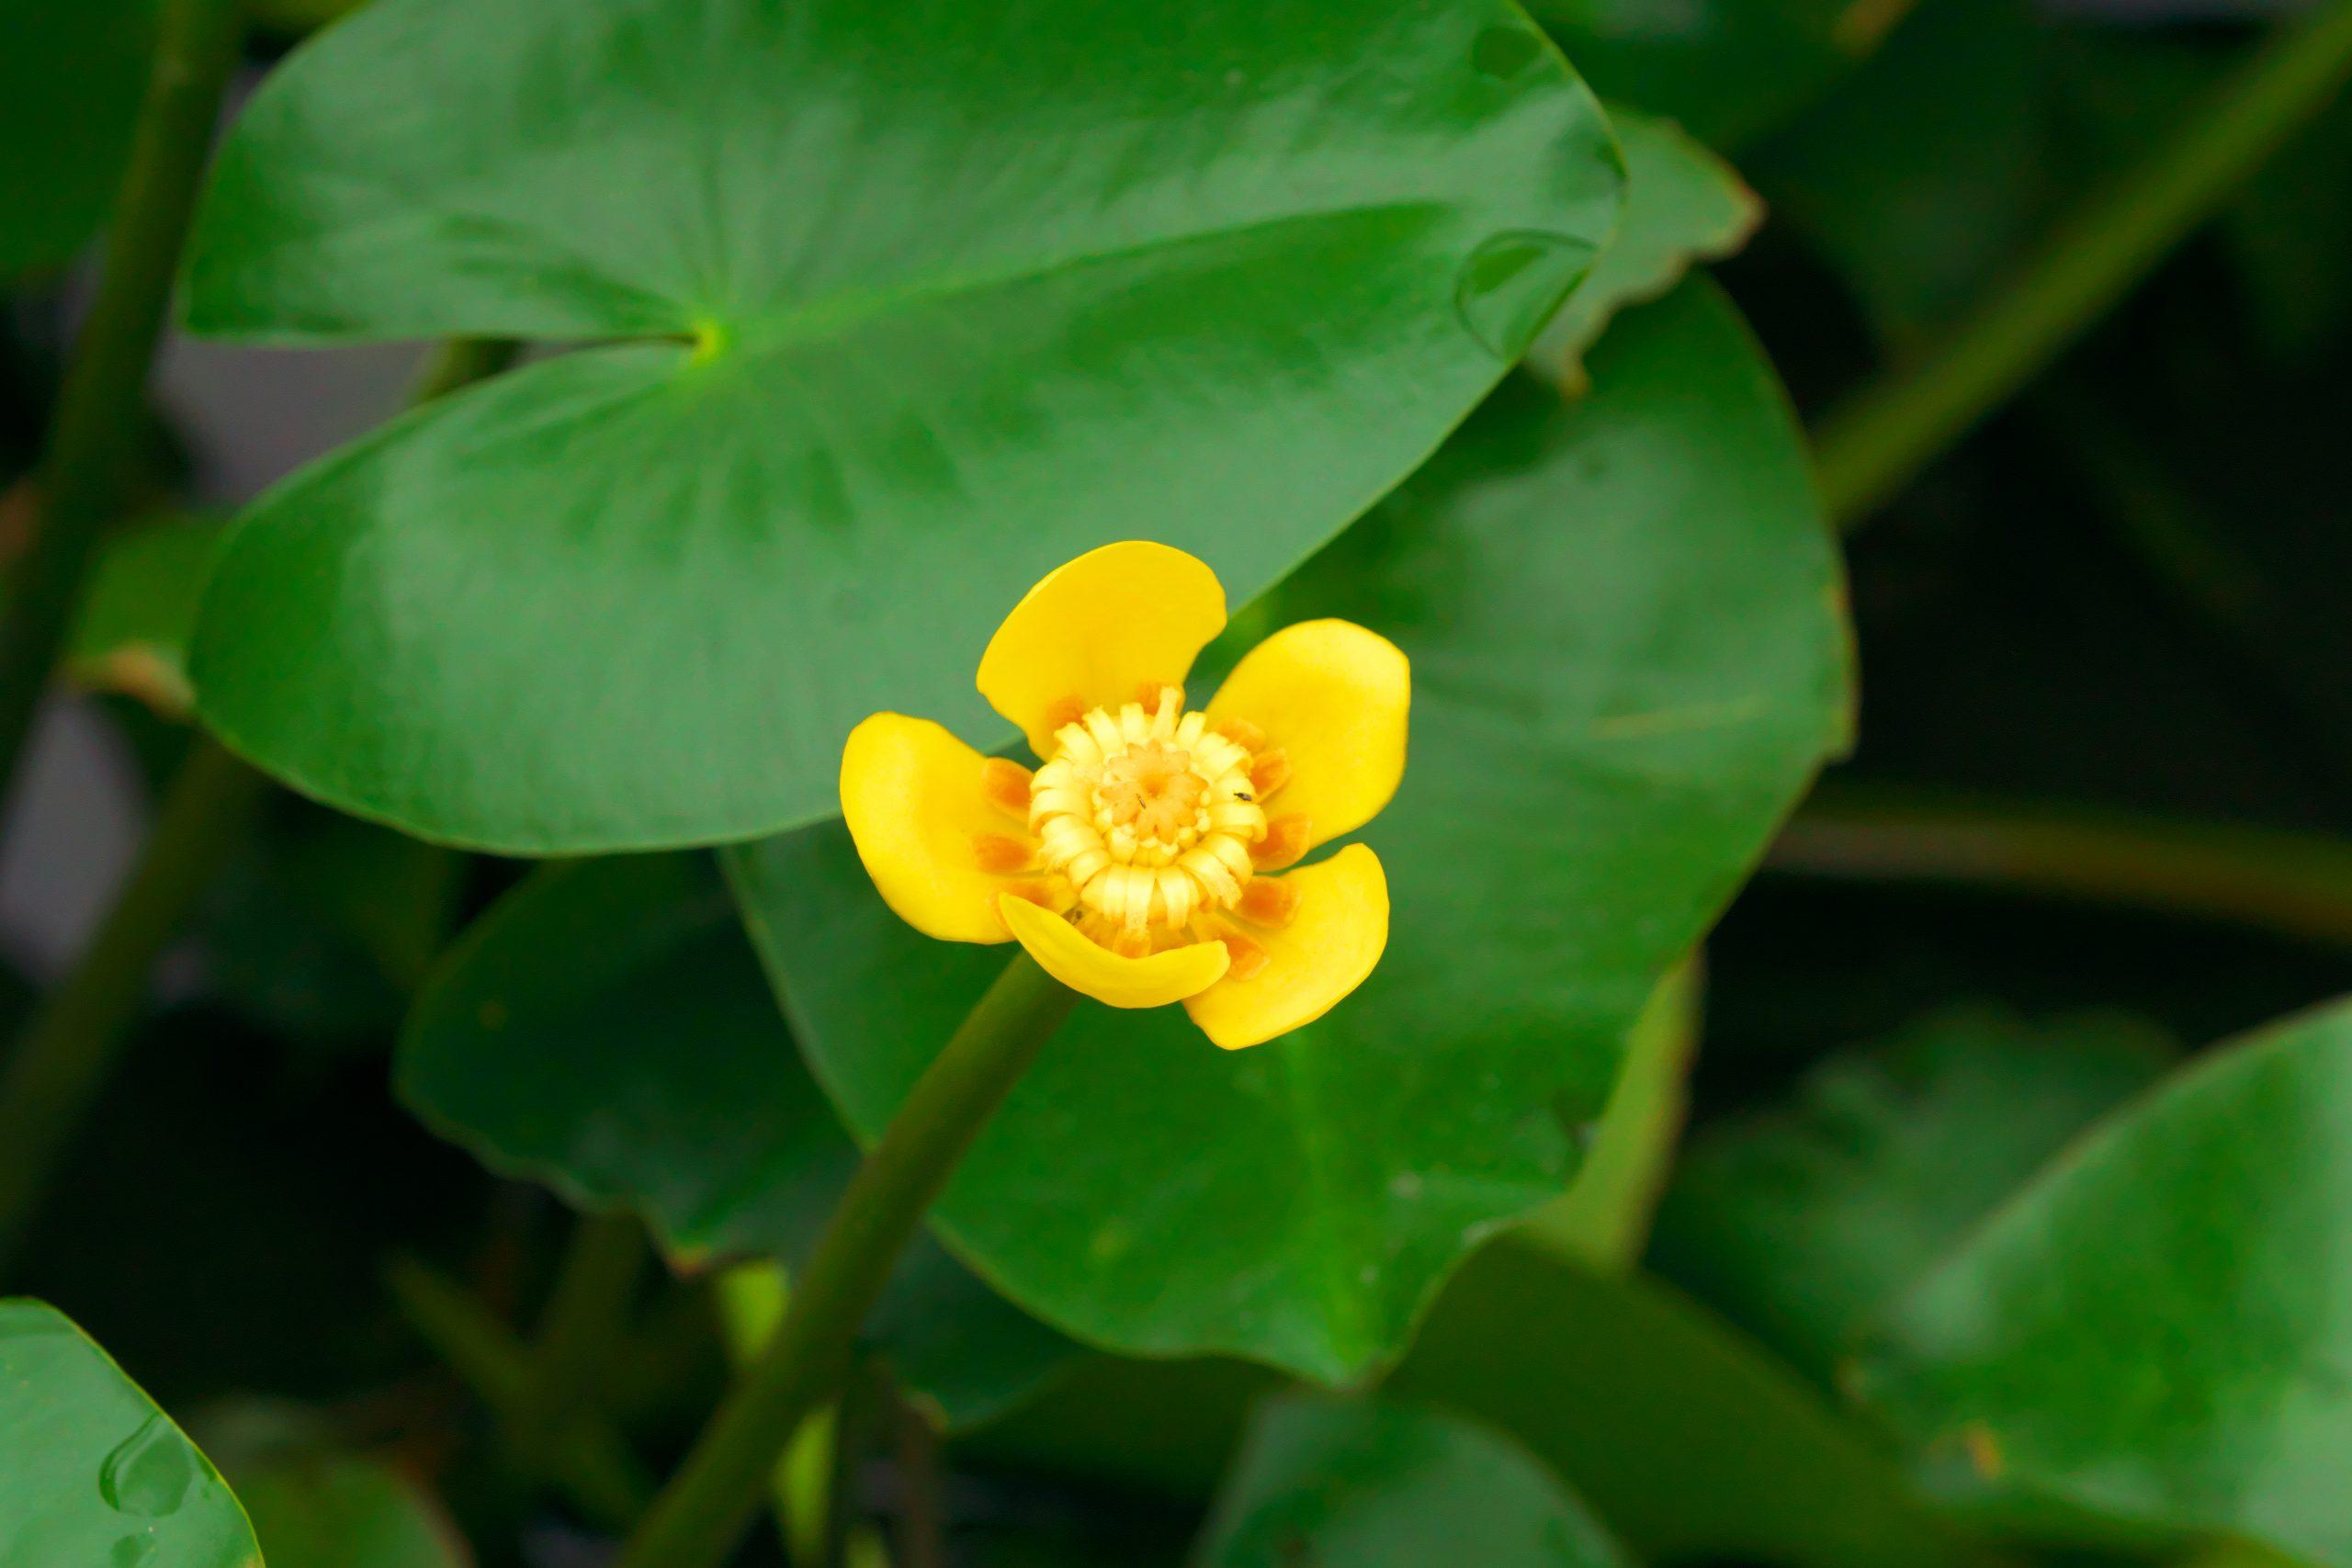 【SONY】この季節に咲く花(33)